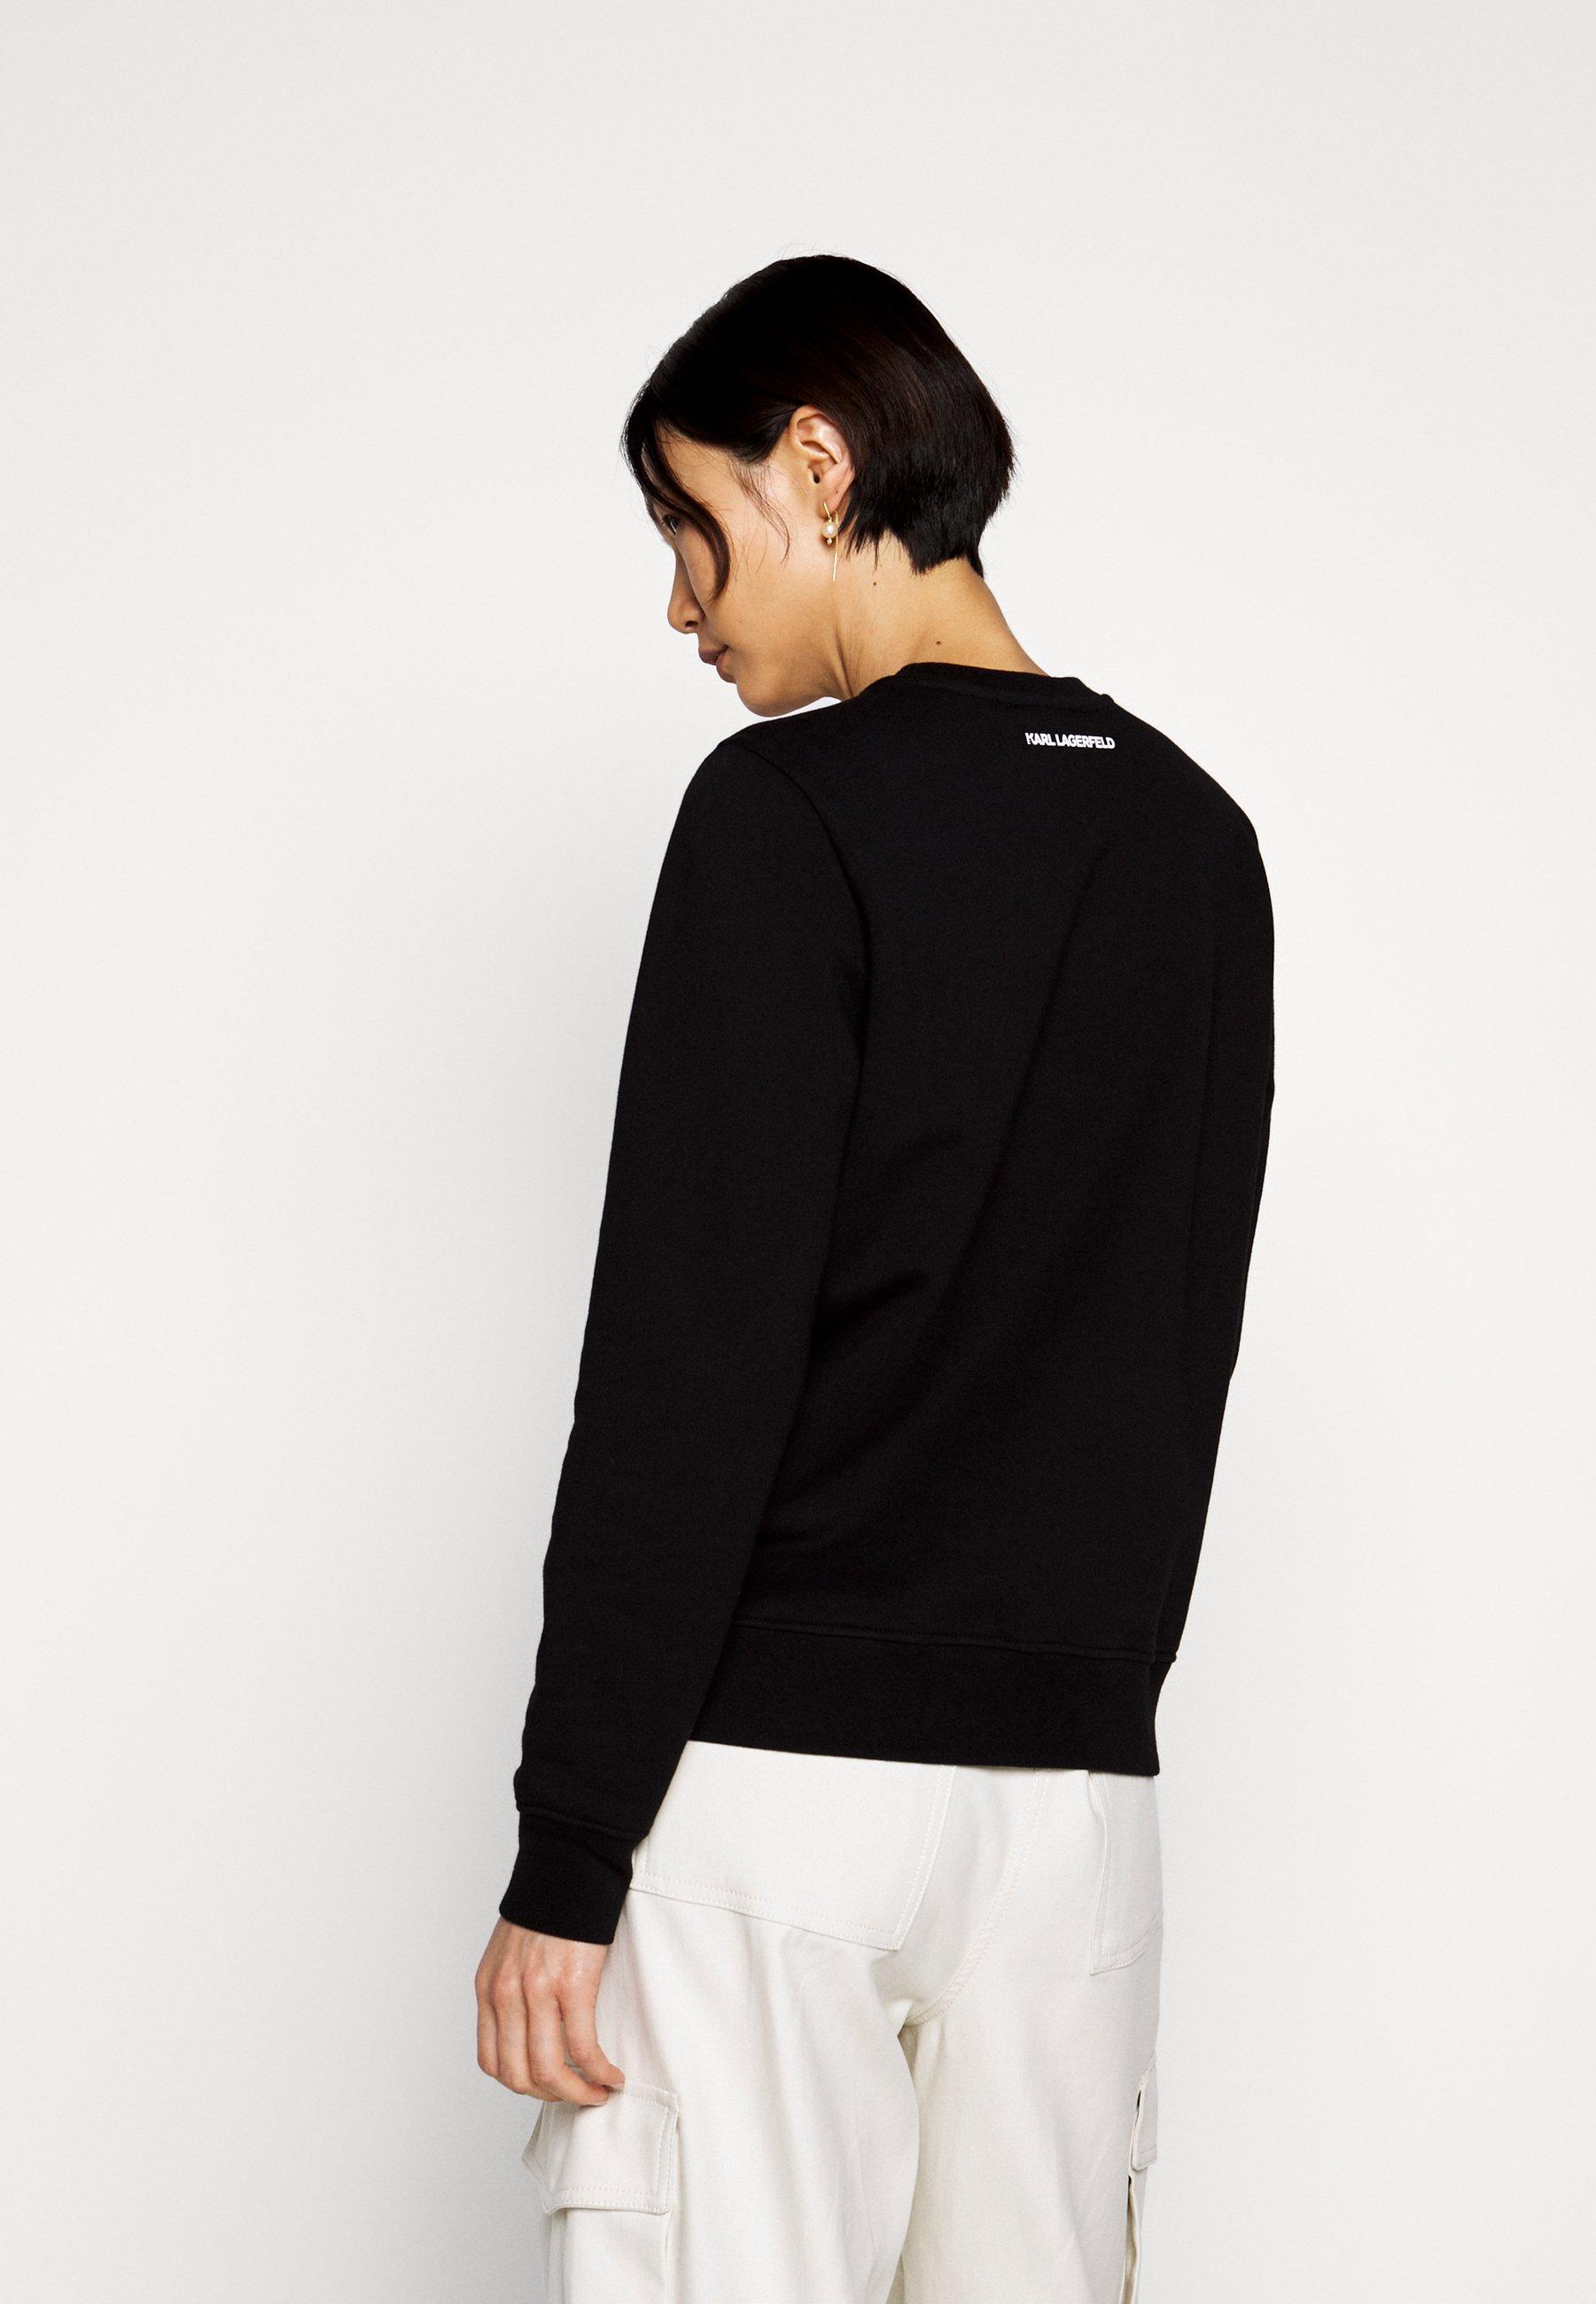 2020 Cool Women's Clothing KARL LAGERFELD IKONIK Sweatshirt black qqqITyziT